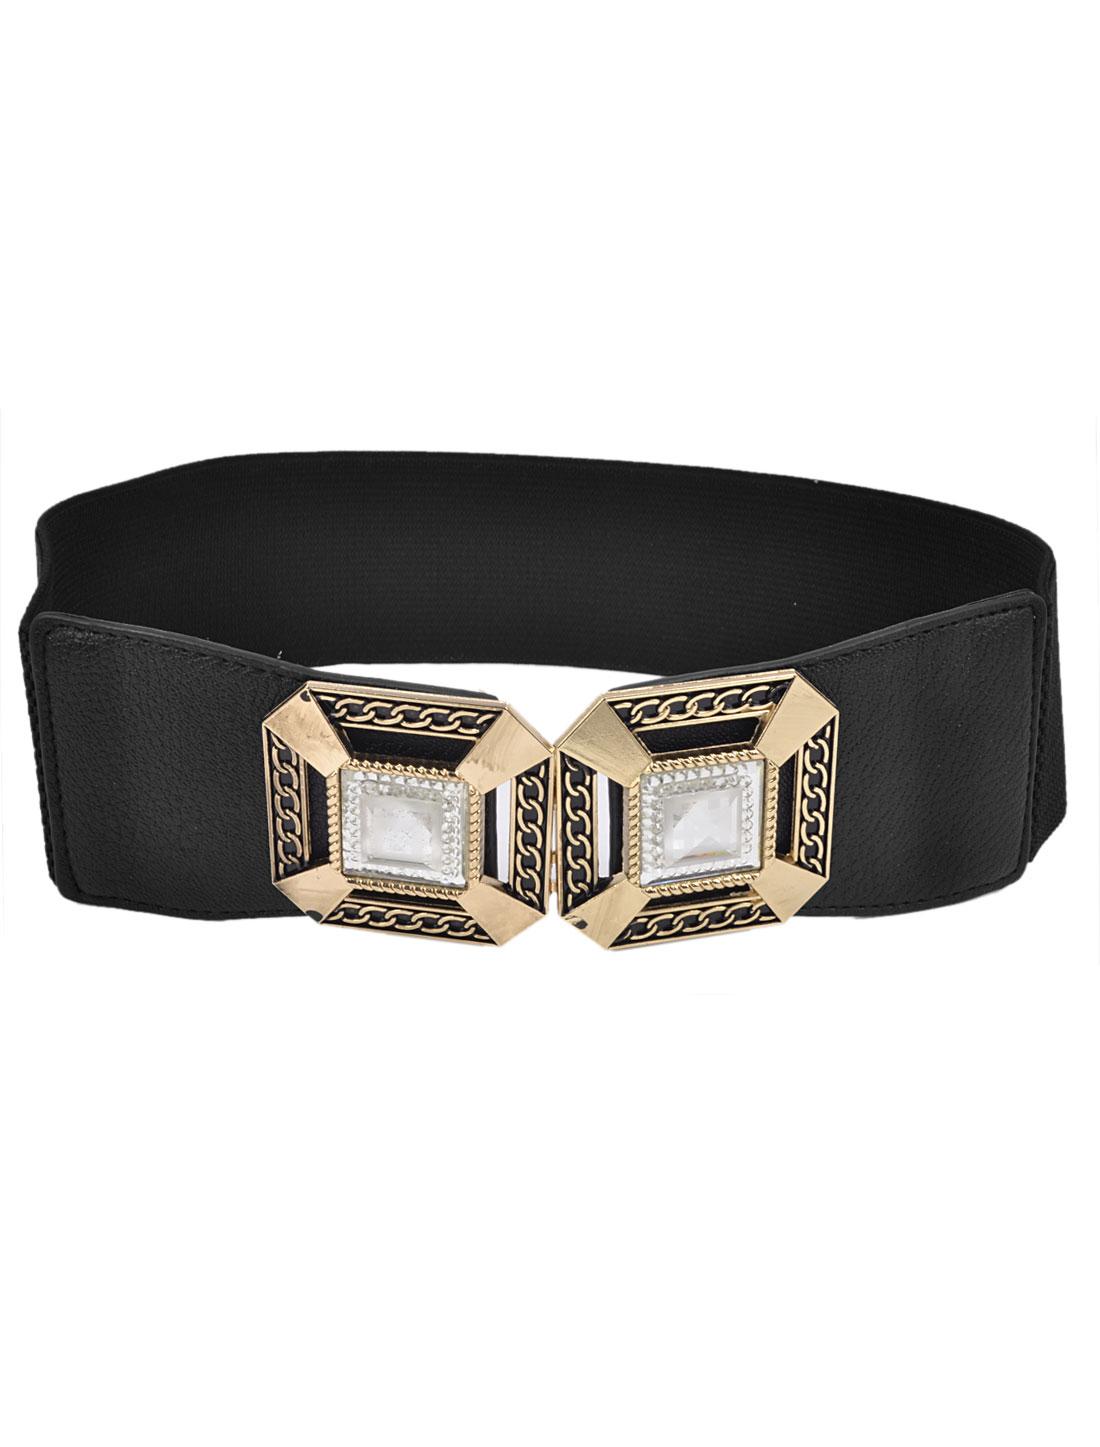 Women Square Crystals Inlaid Hook Buckle 6cm Width Stretch Cinch Belt Black